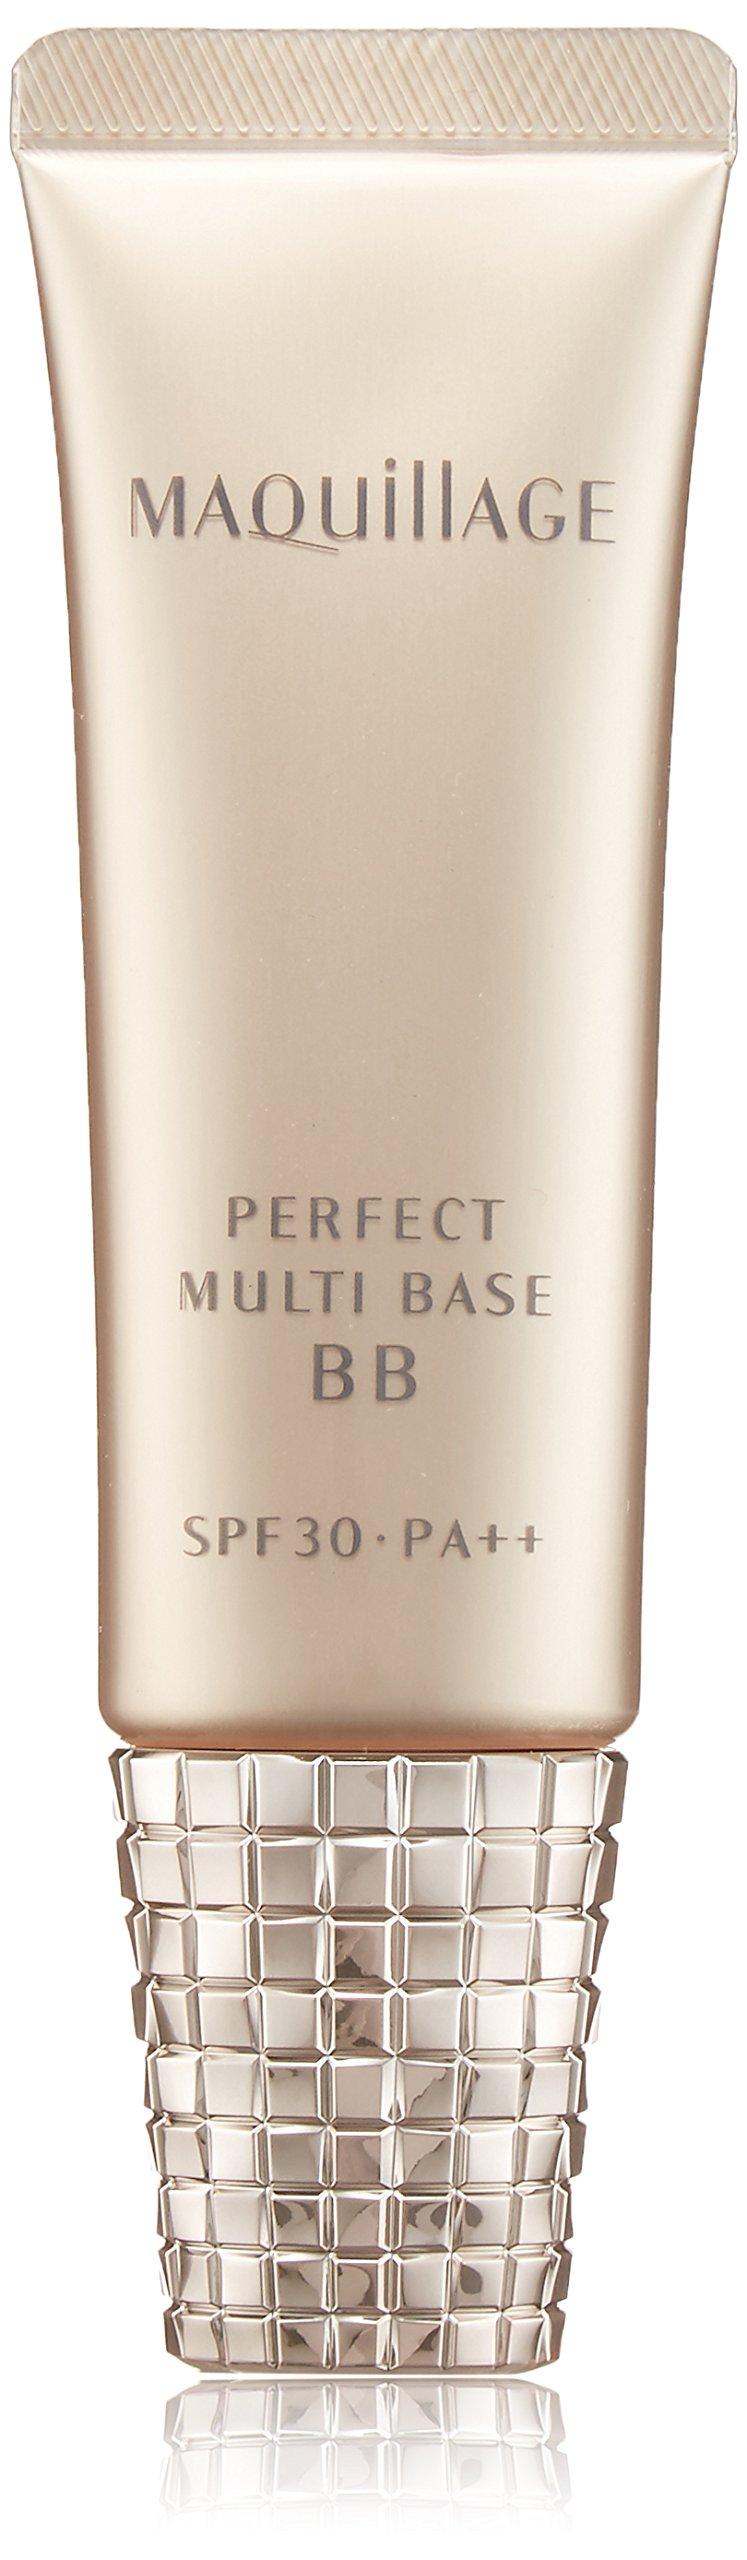 Shiseido MAQuillAGE Perfect Multi Base BB #Natural